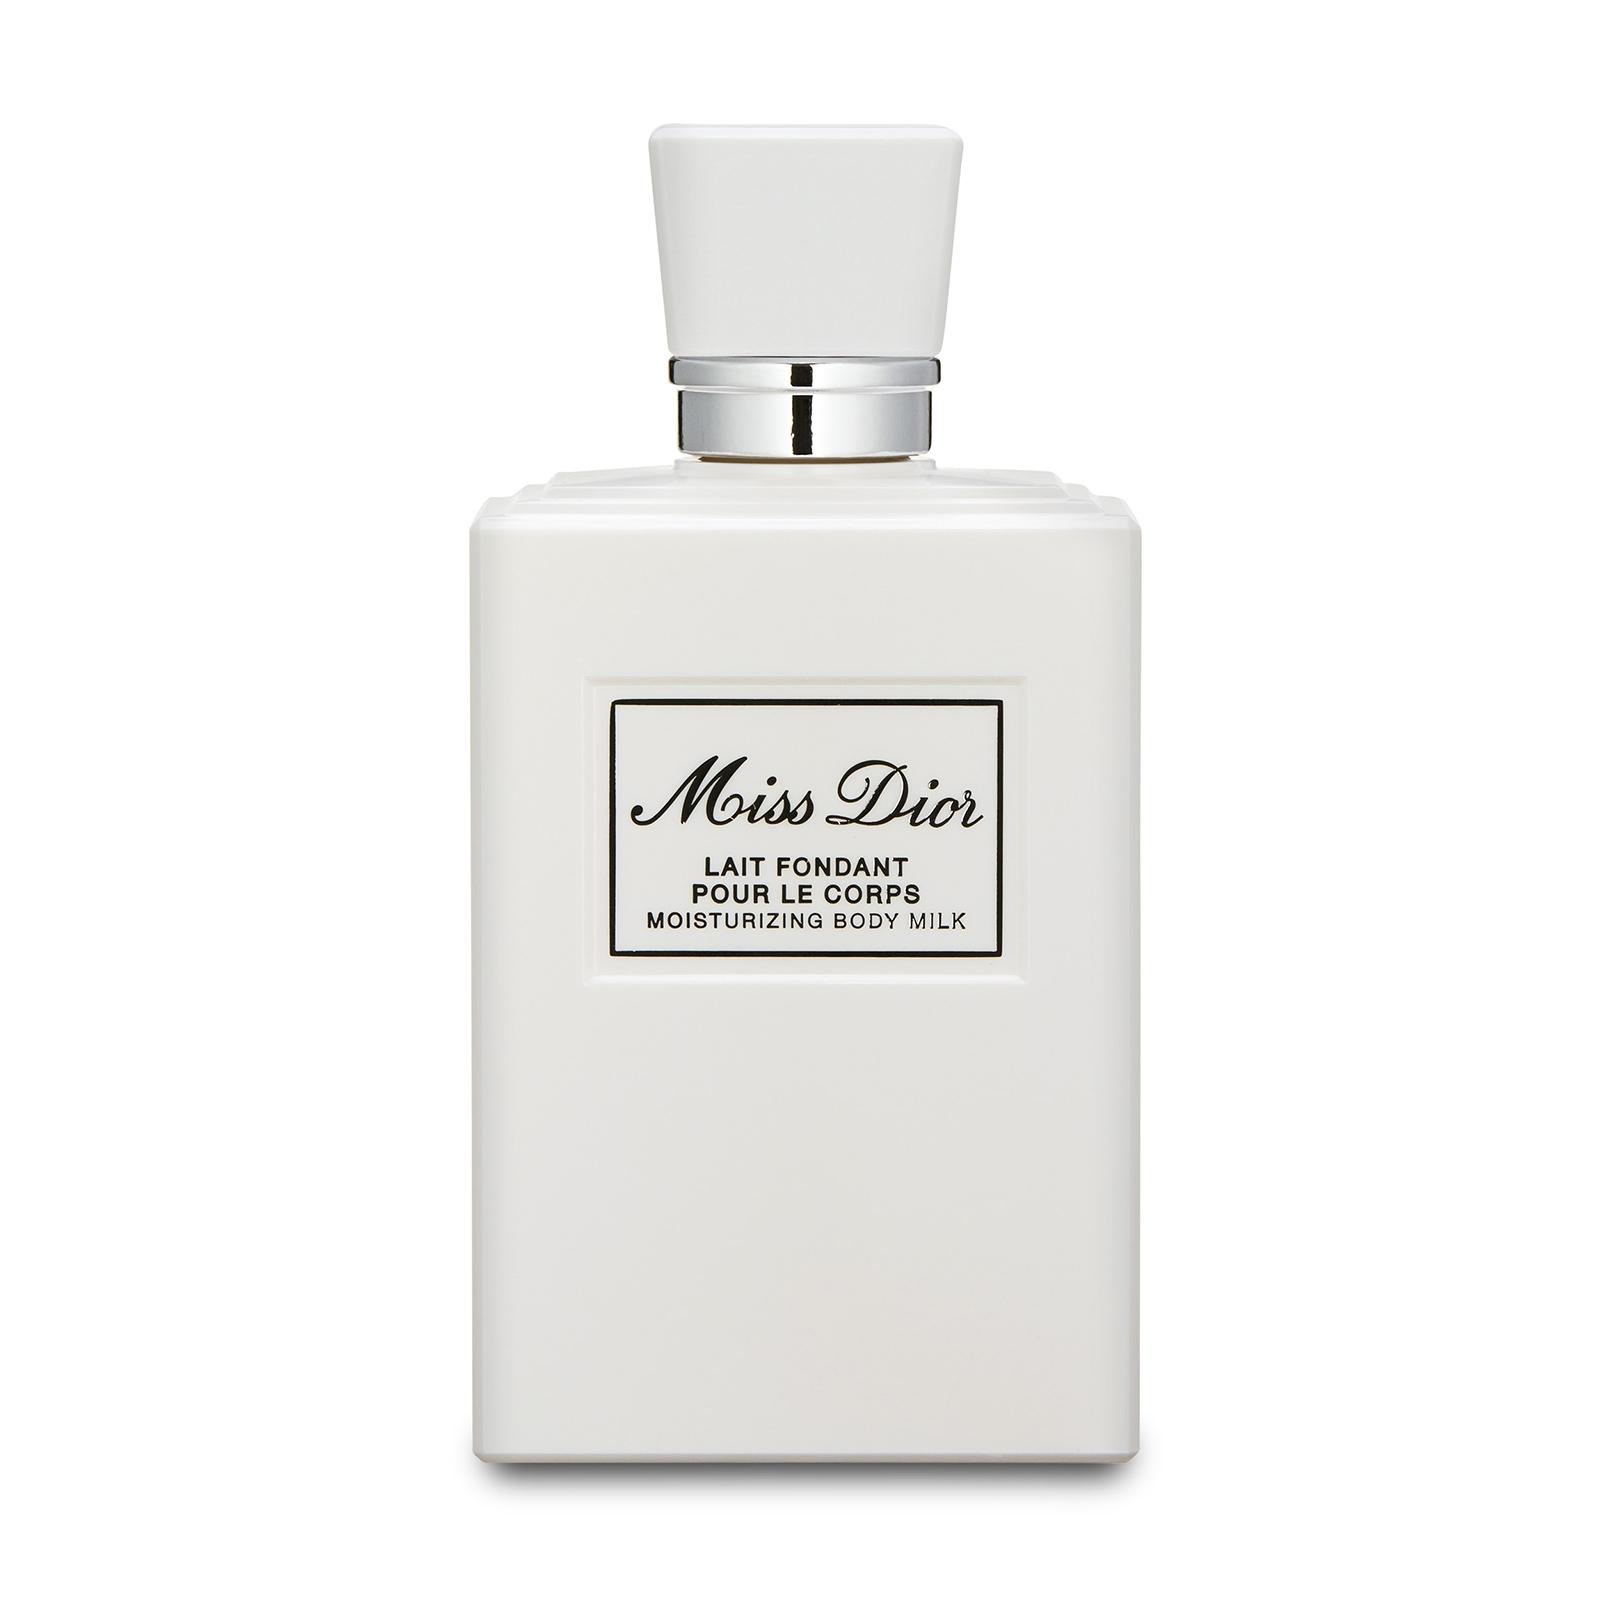 DIOR MISS DIOR LAIT FONDANT POUR LE CORPS MOISTURIZING BODY MILK 200ML (Tester box) โลชั่น Miss Dior สุดหอมและชุ่มชื่น